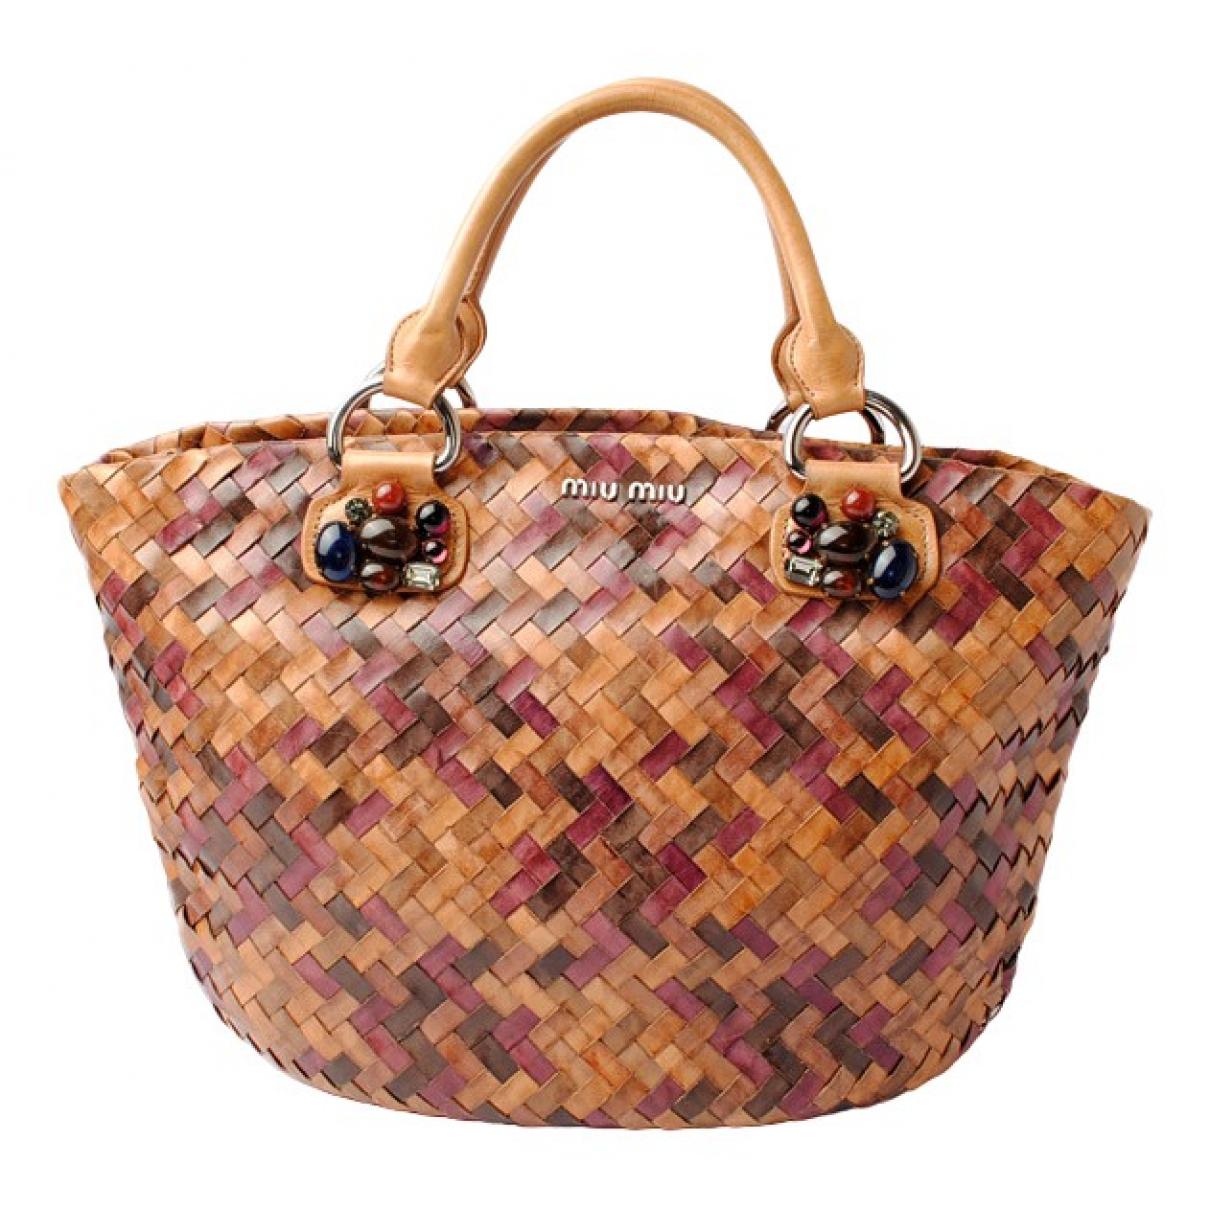 Miu Miu \N Handtasche in  Bunt Leder